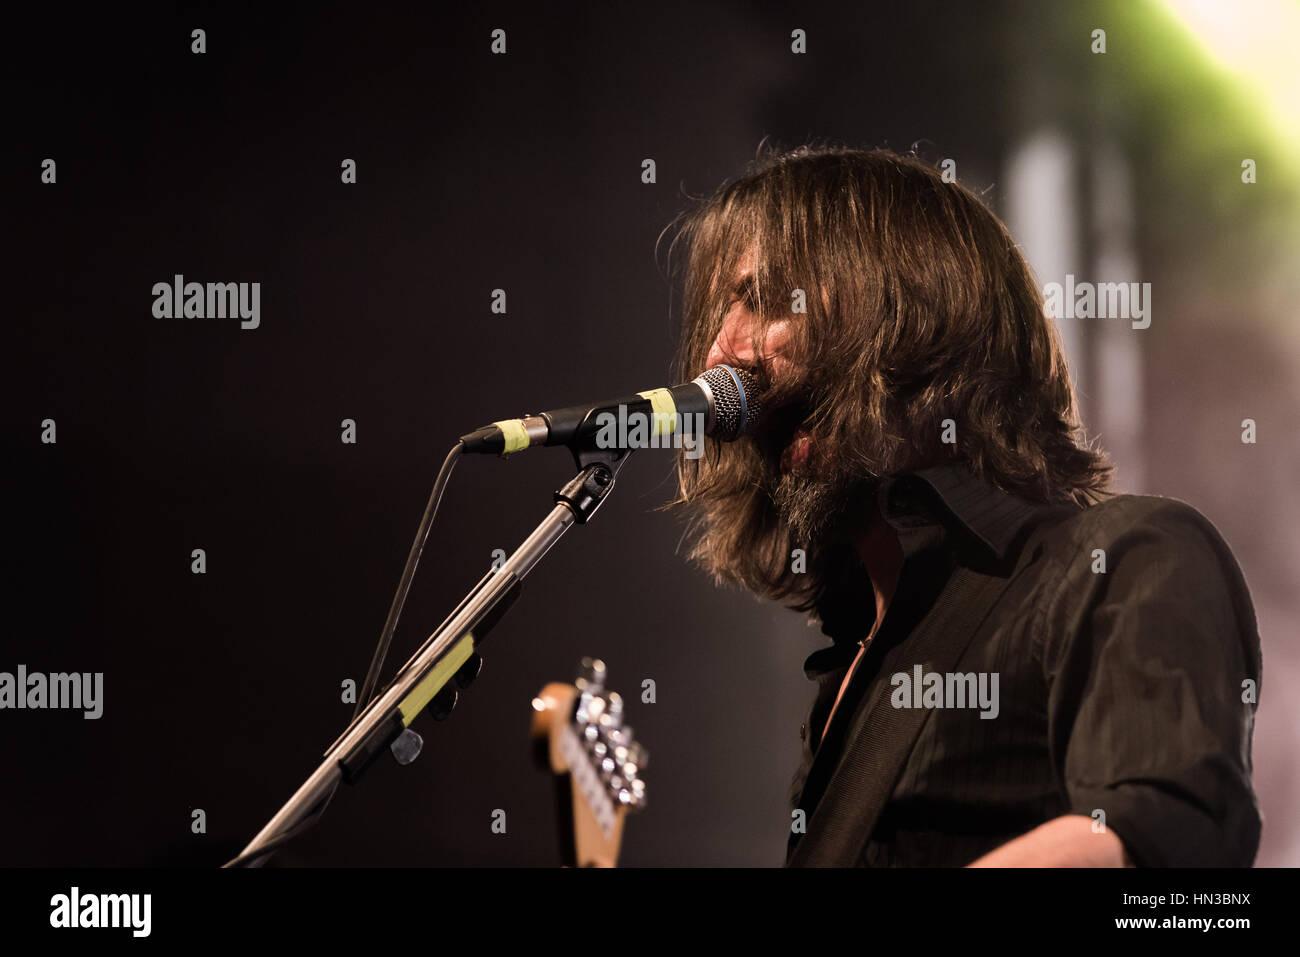 Bergamo, Italy 27 January 2017. Italian indie rock band Marlene Kuntz (Onorate il vile tour) perform at music club Stock Photo